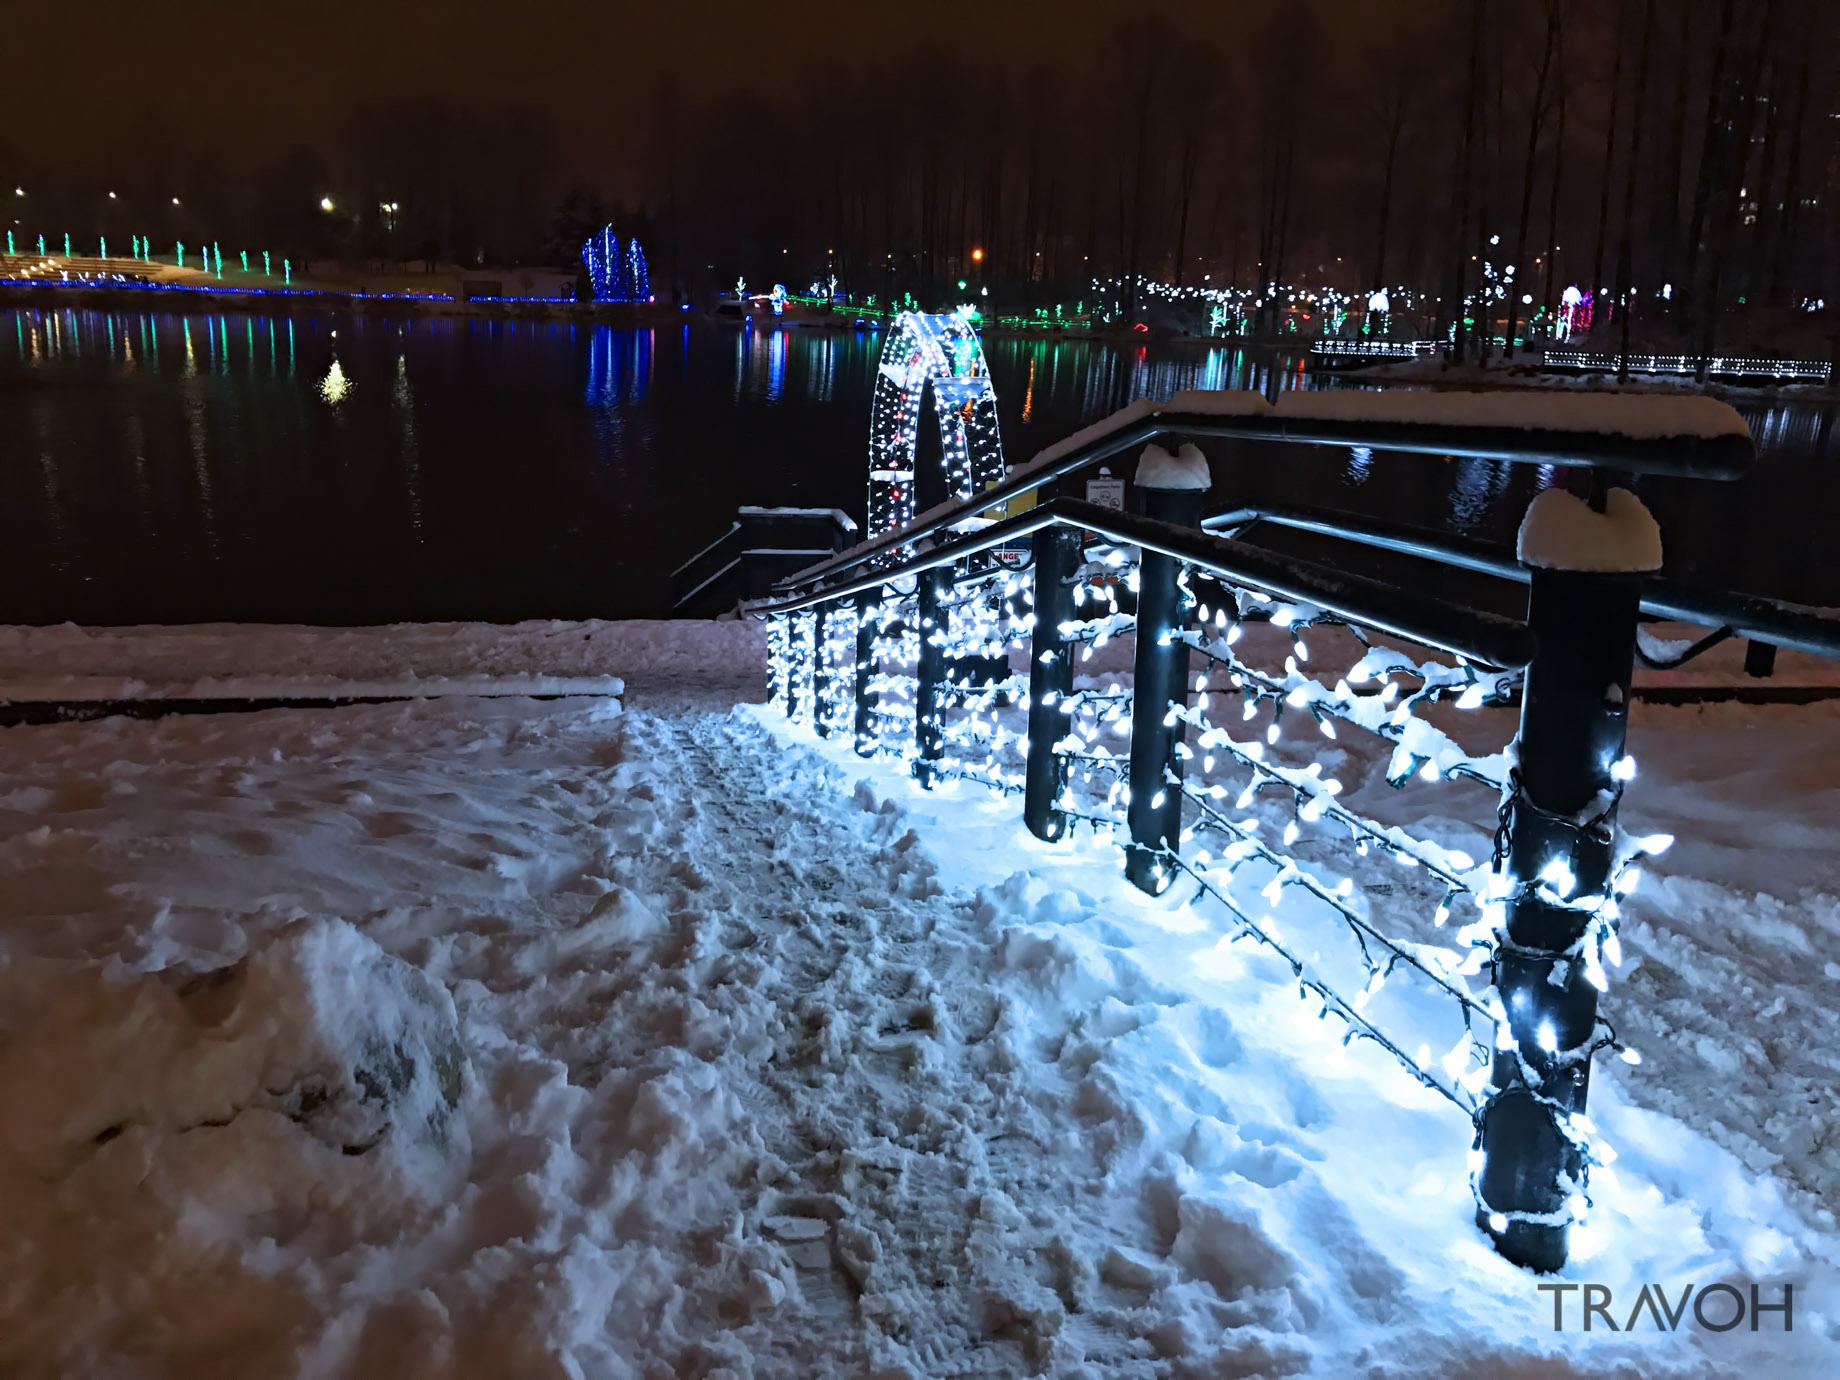 Lafarge Winter Lights Display - Arbour Walk - Coquitlam, BC, Canada